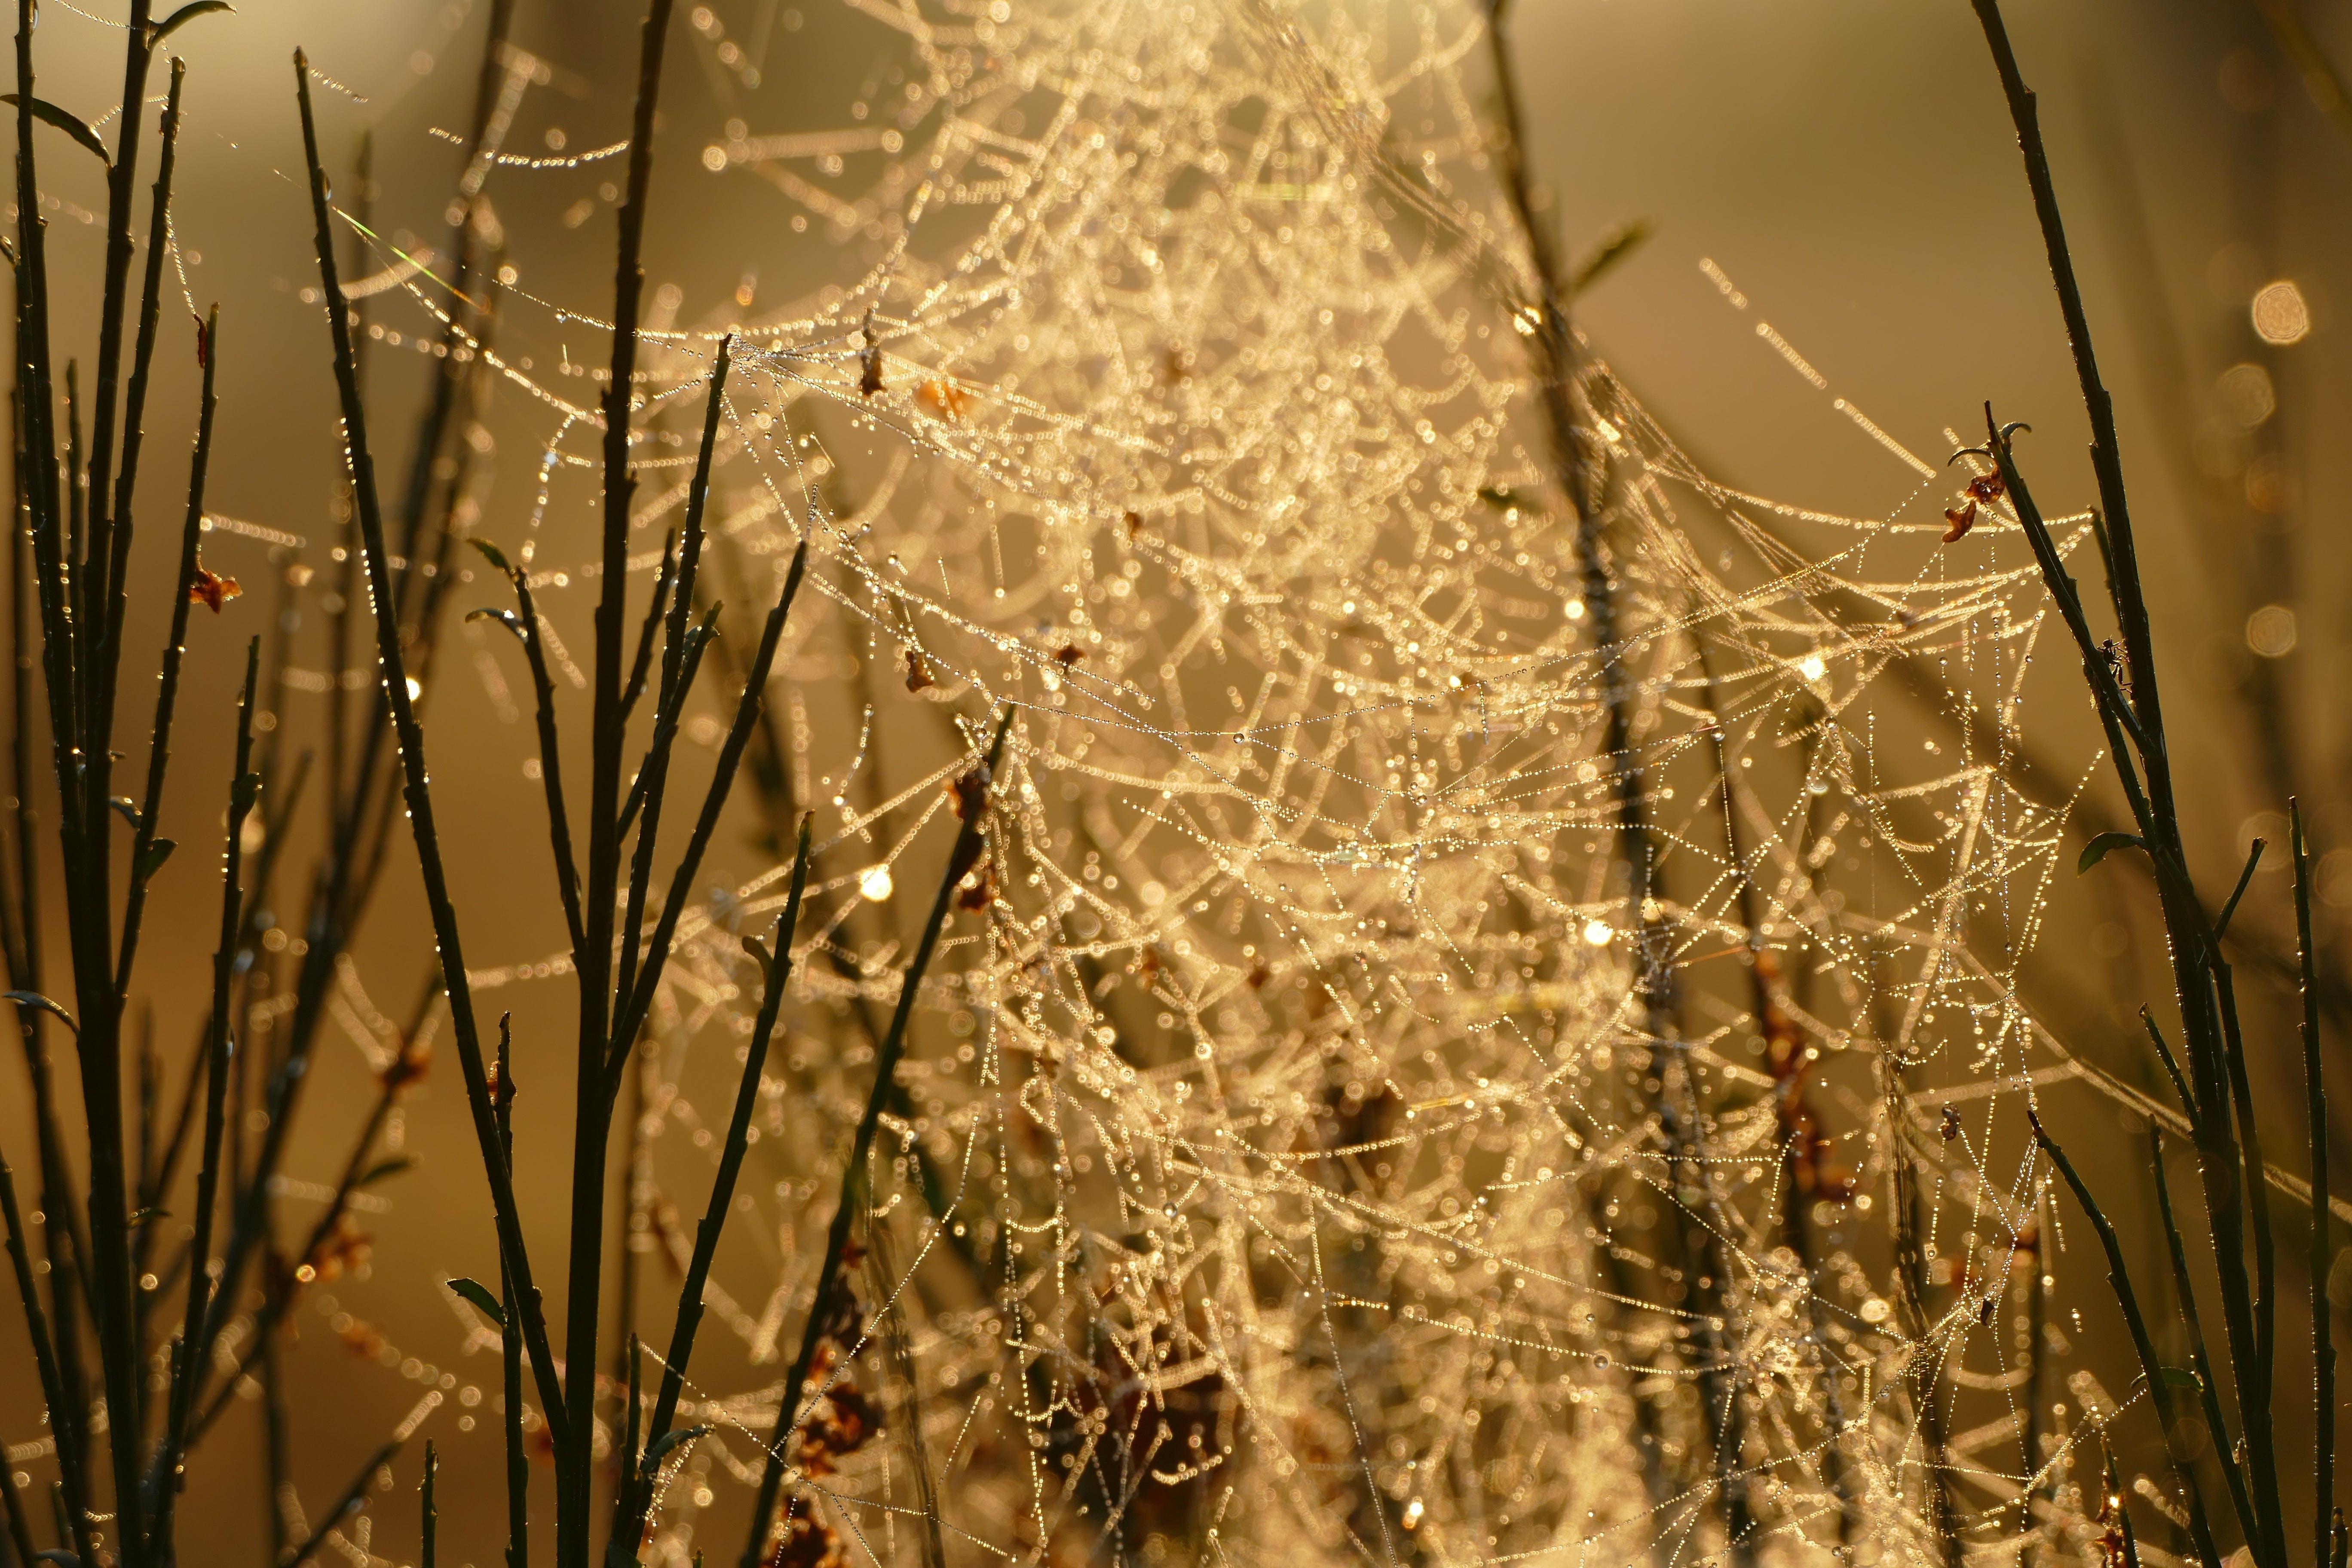 Spider Web on Black Stick